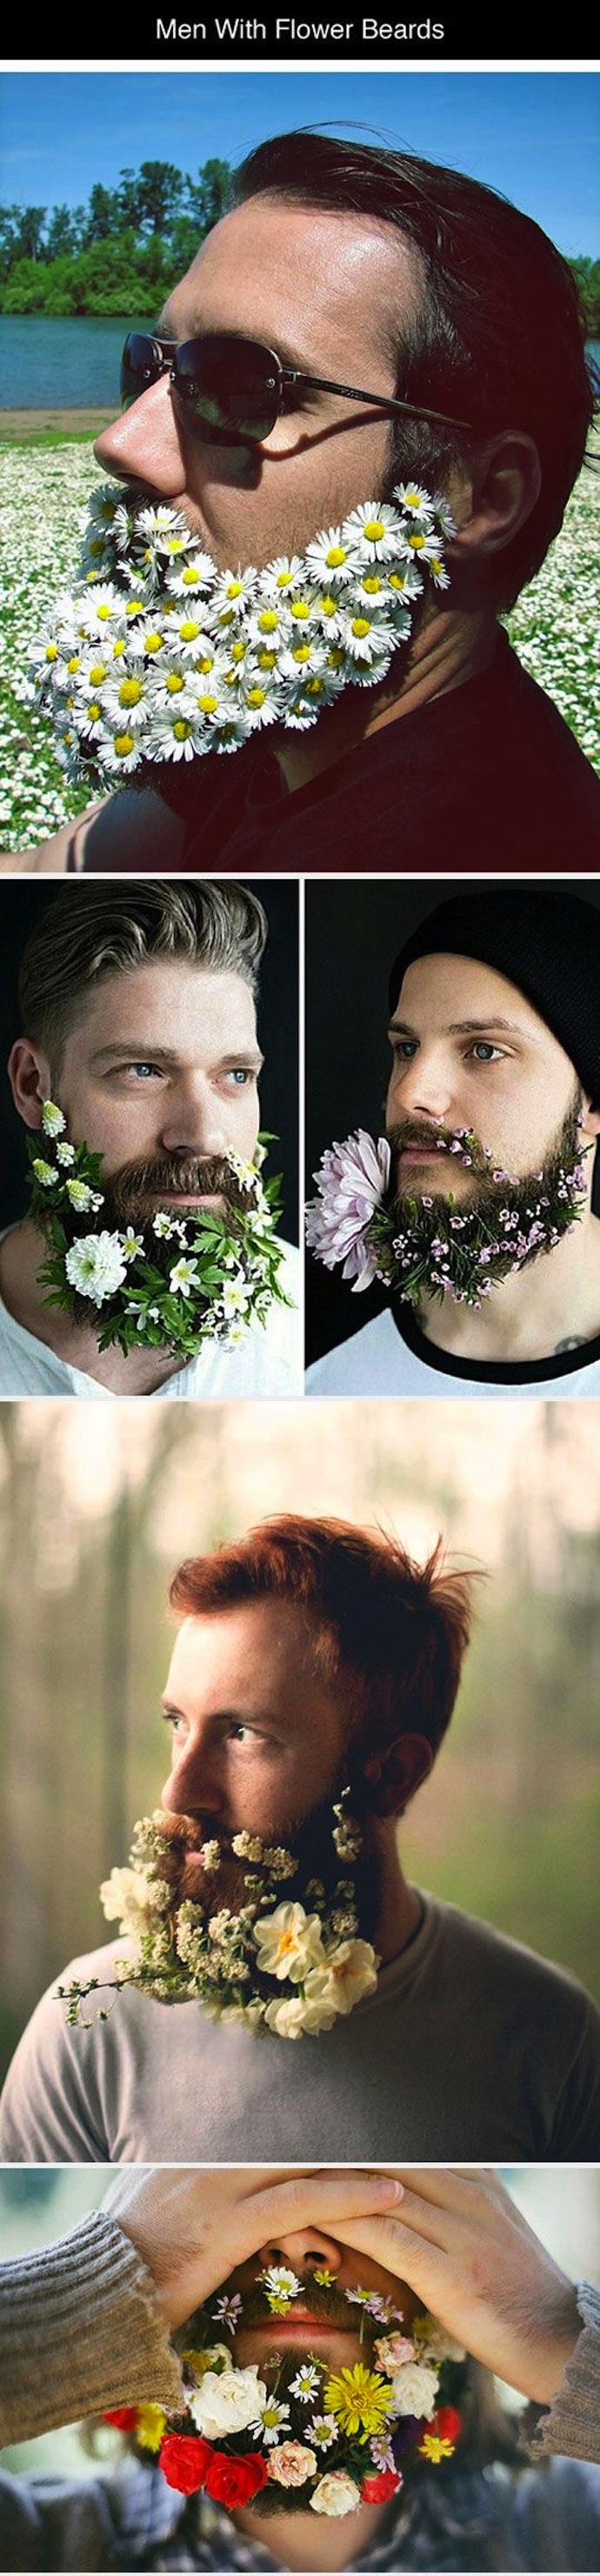 flower-beard